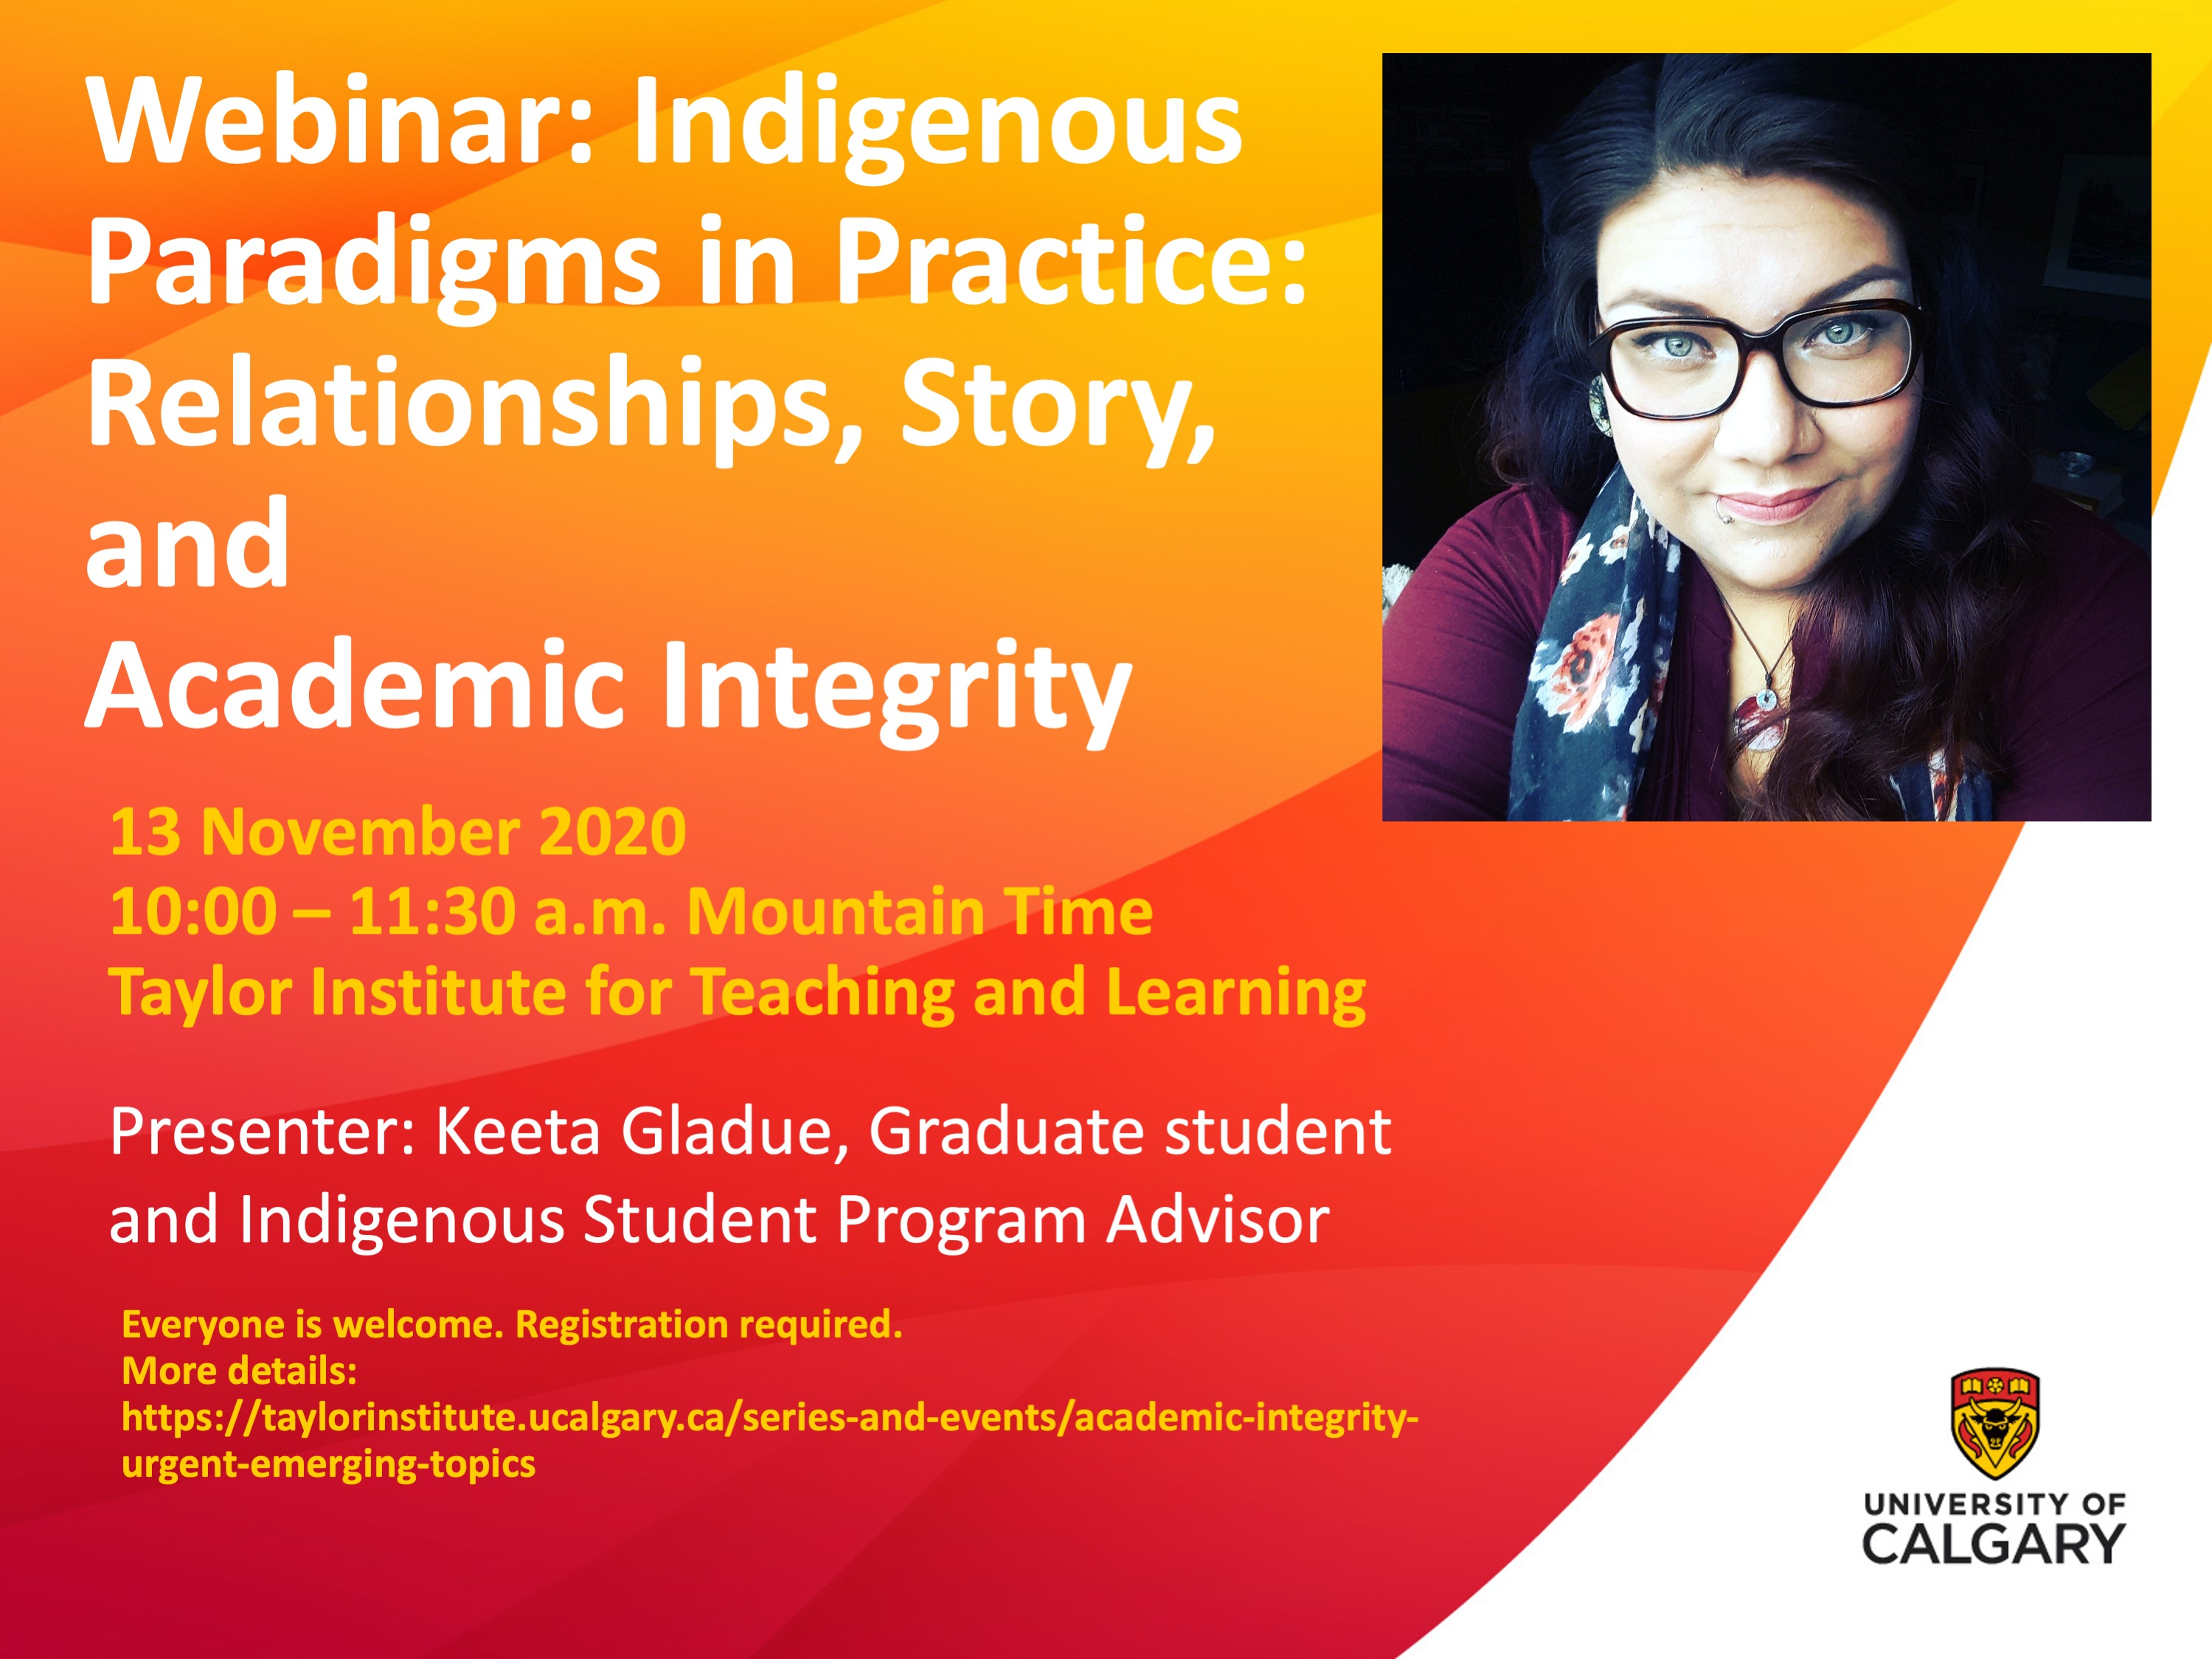 Indigenous Academic Integrity Webinar - Keeta Gladue